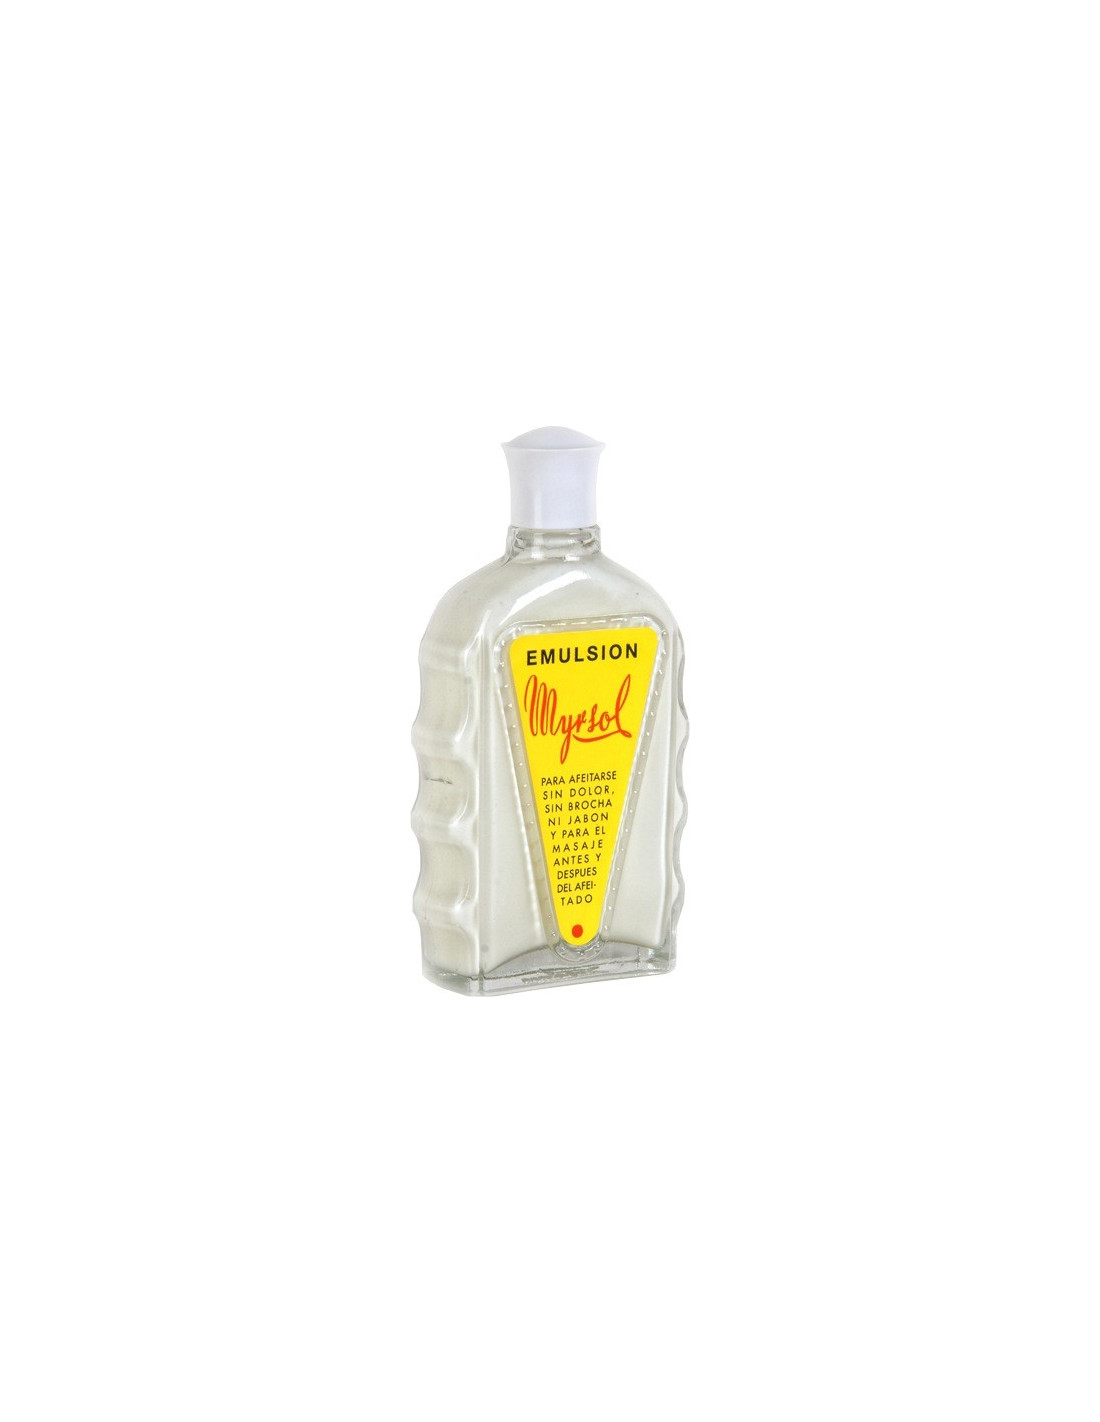 Myrsol emulsión sin alcohol para el afeitado 7b3e81e546c0